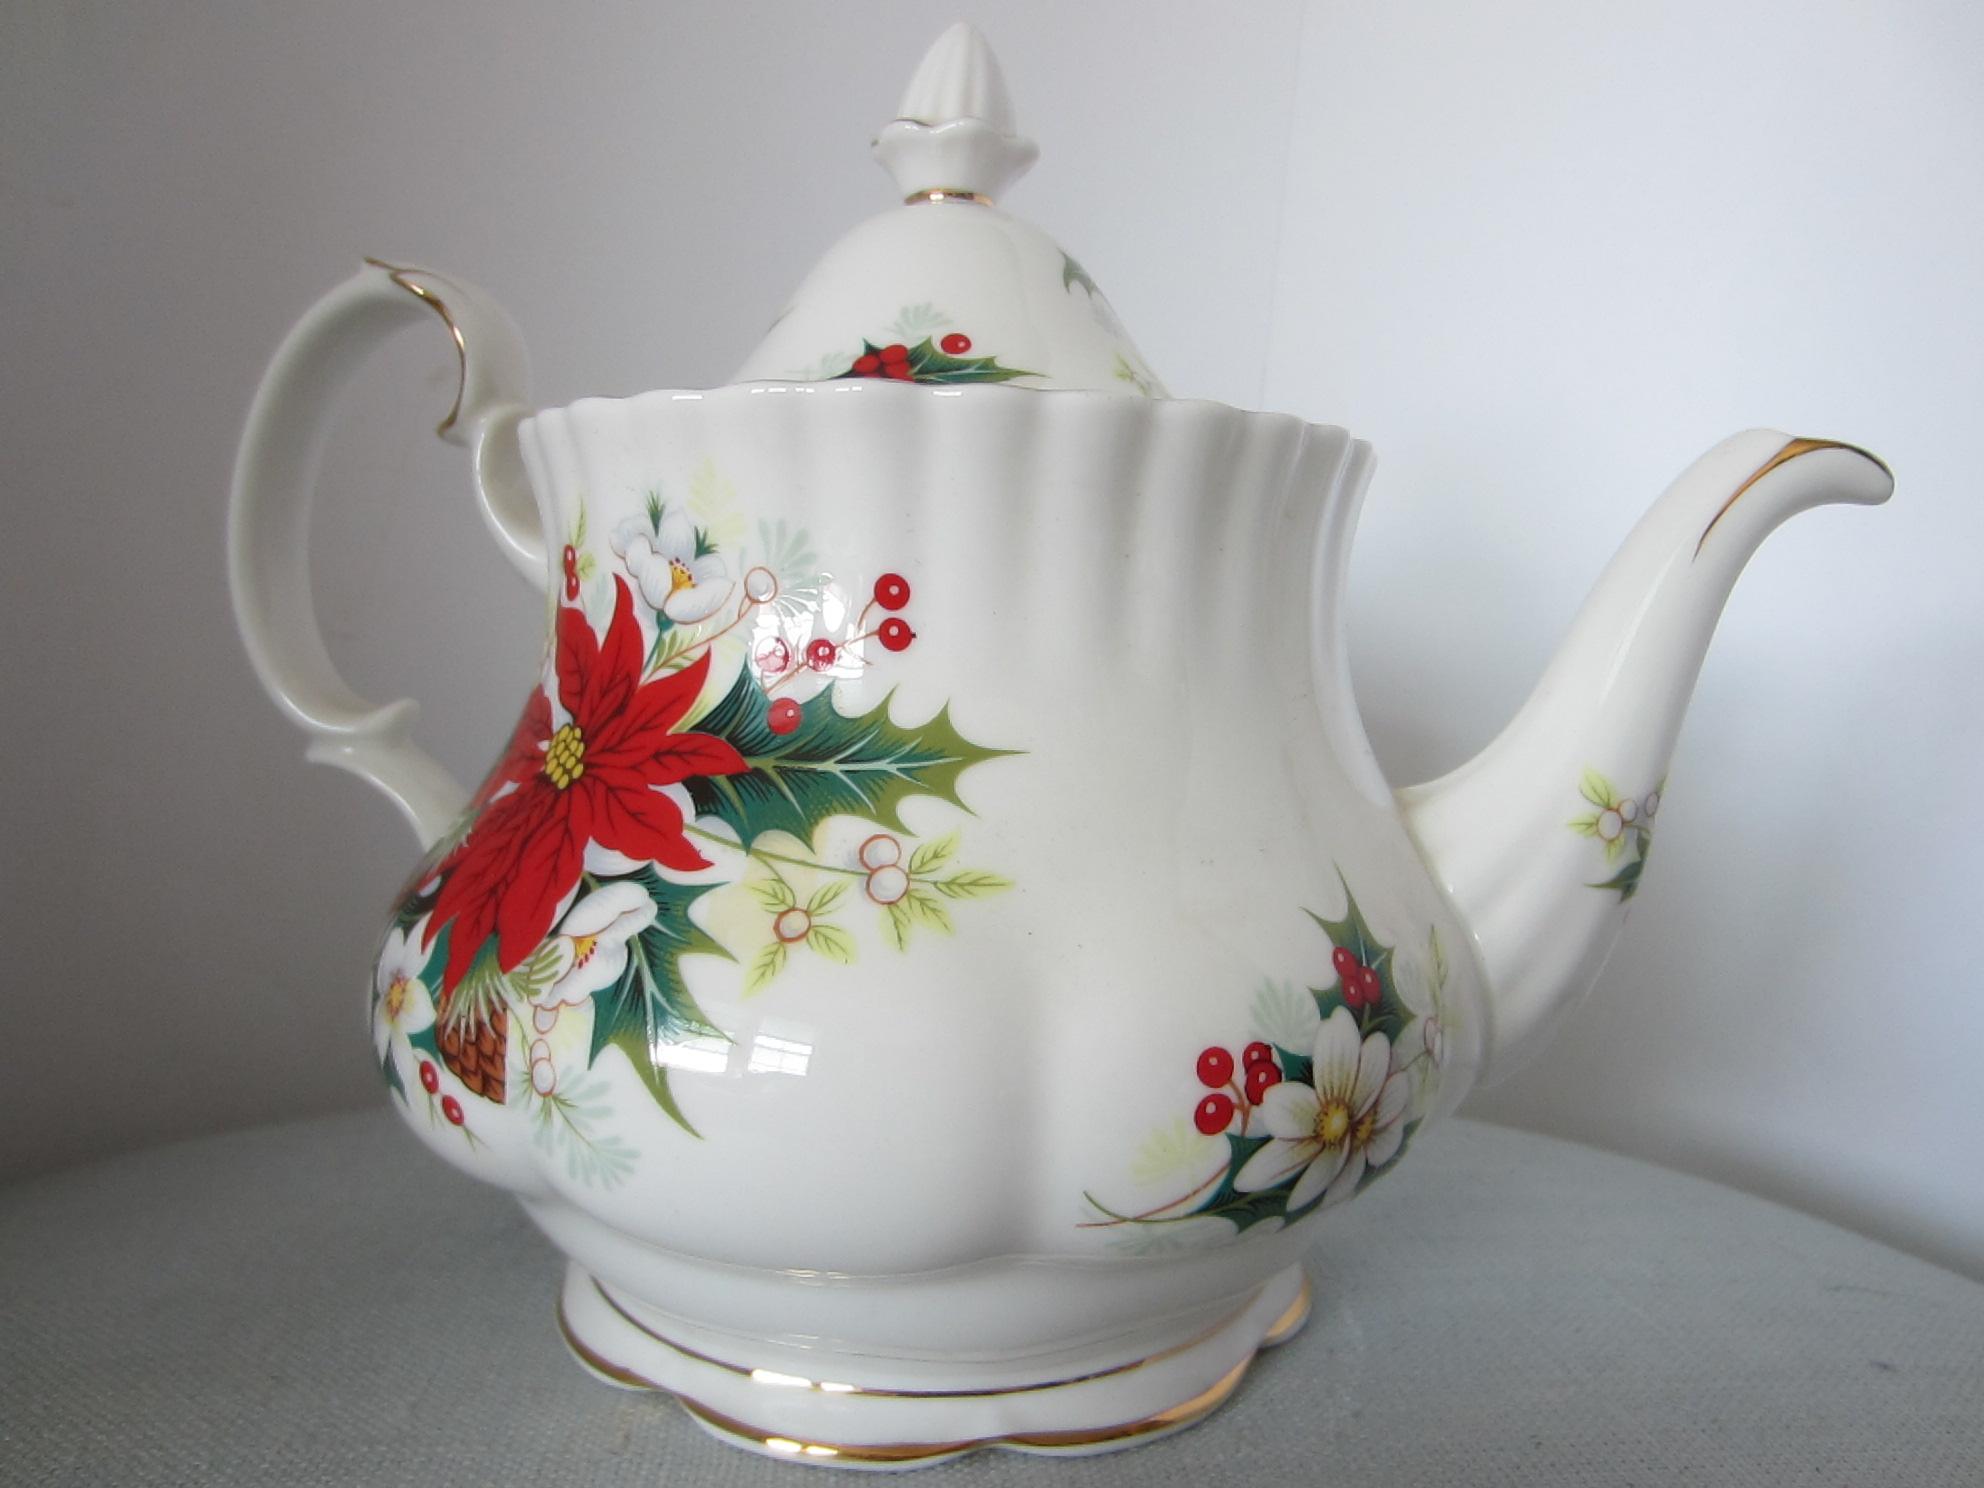 Royal Albert Bone China England Poinsettia Teapot Signed